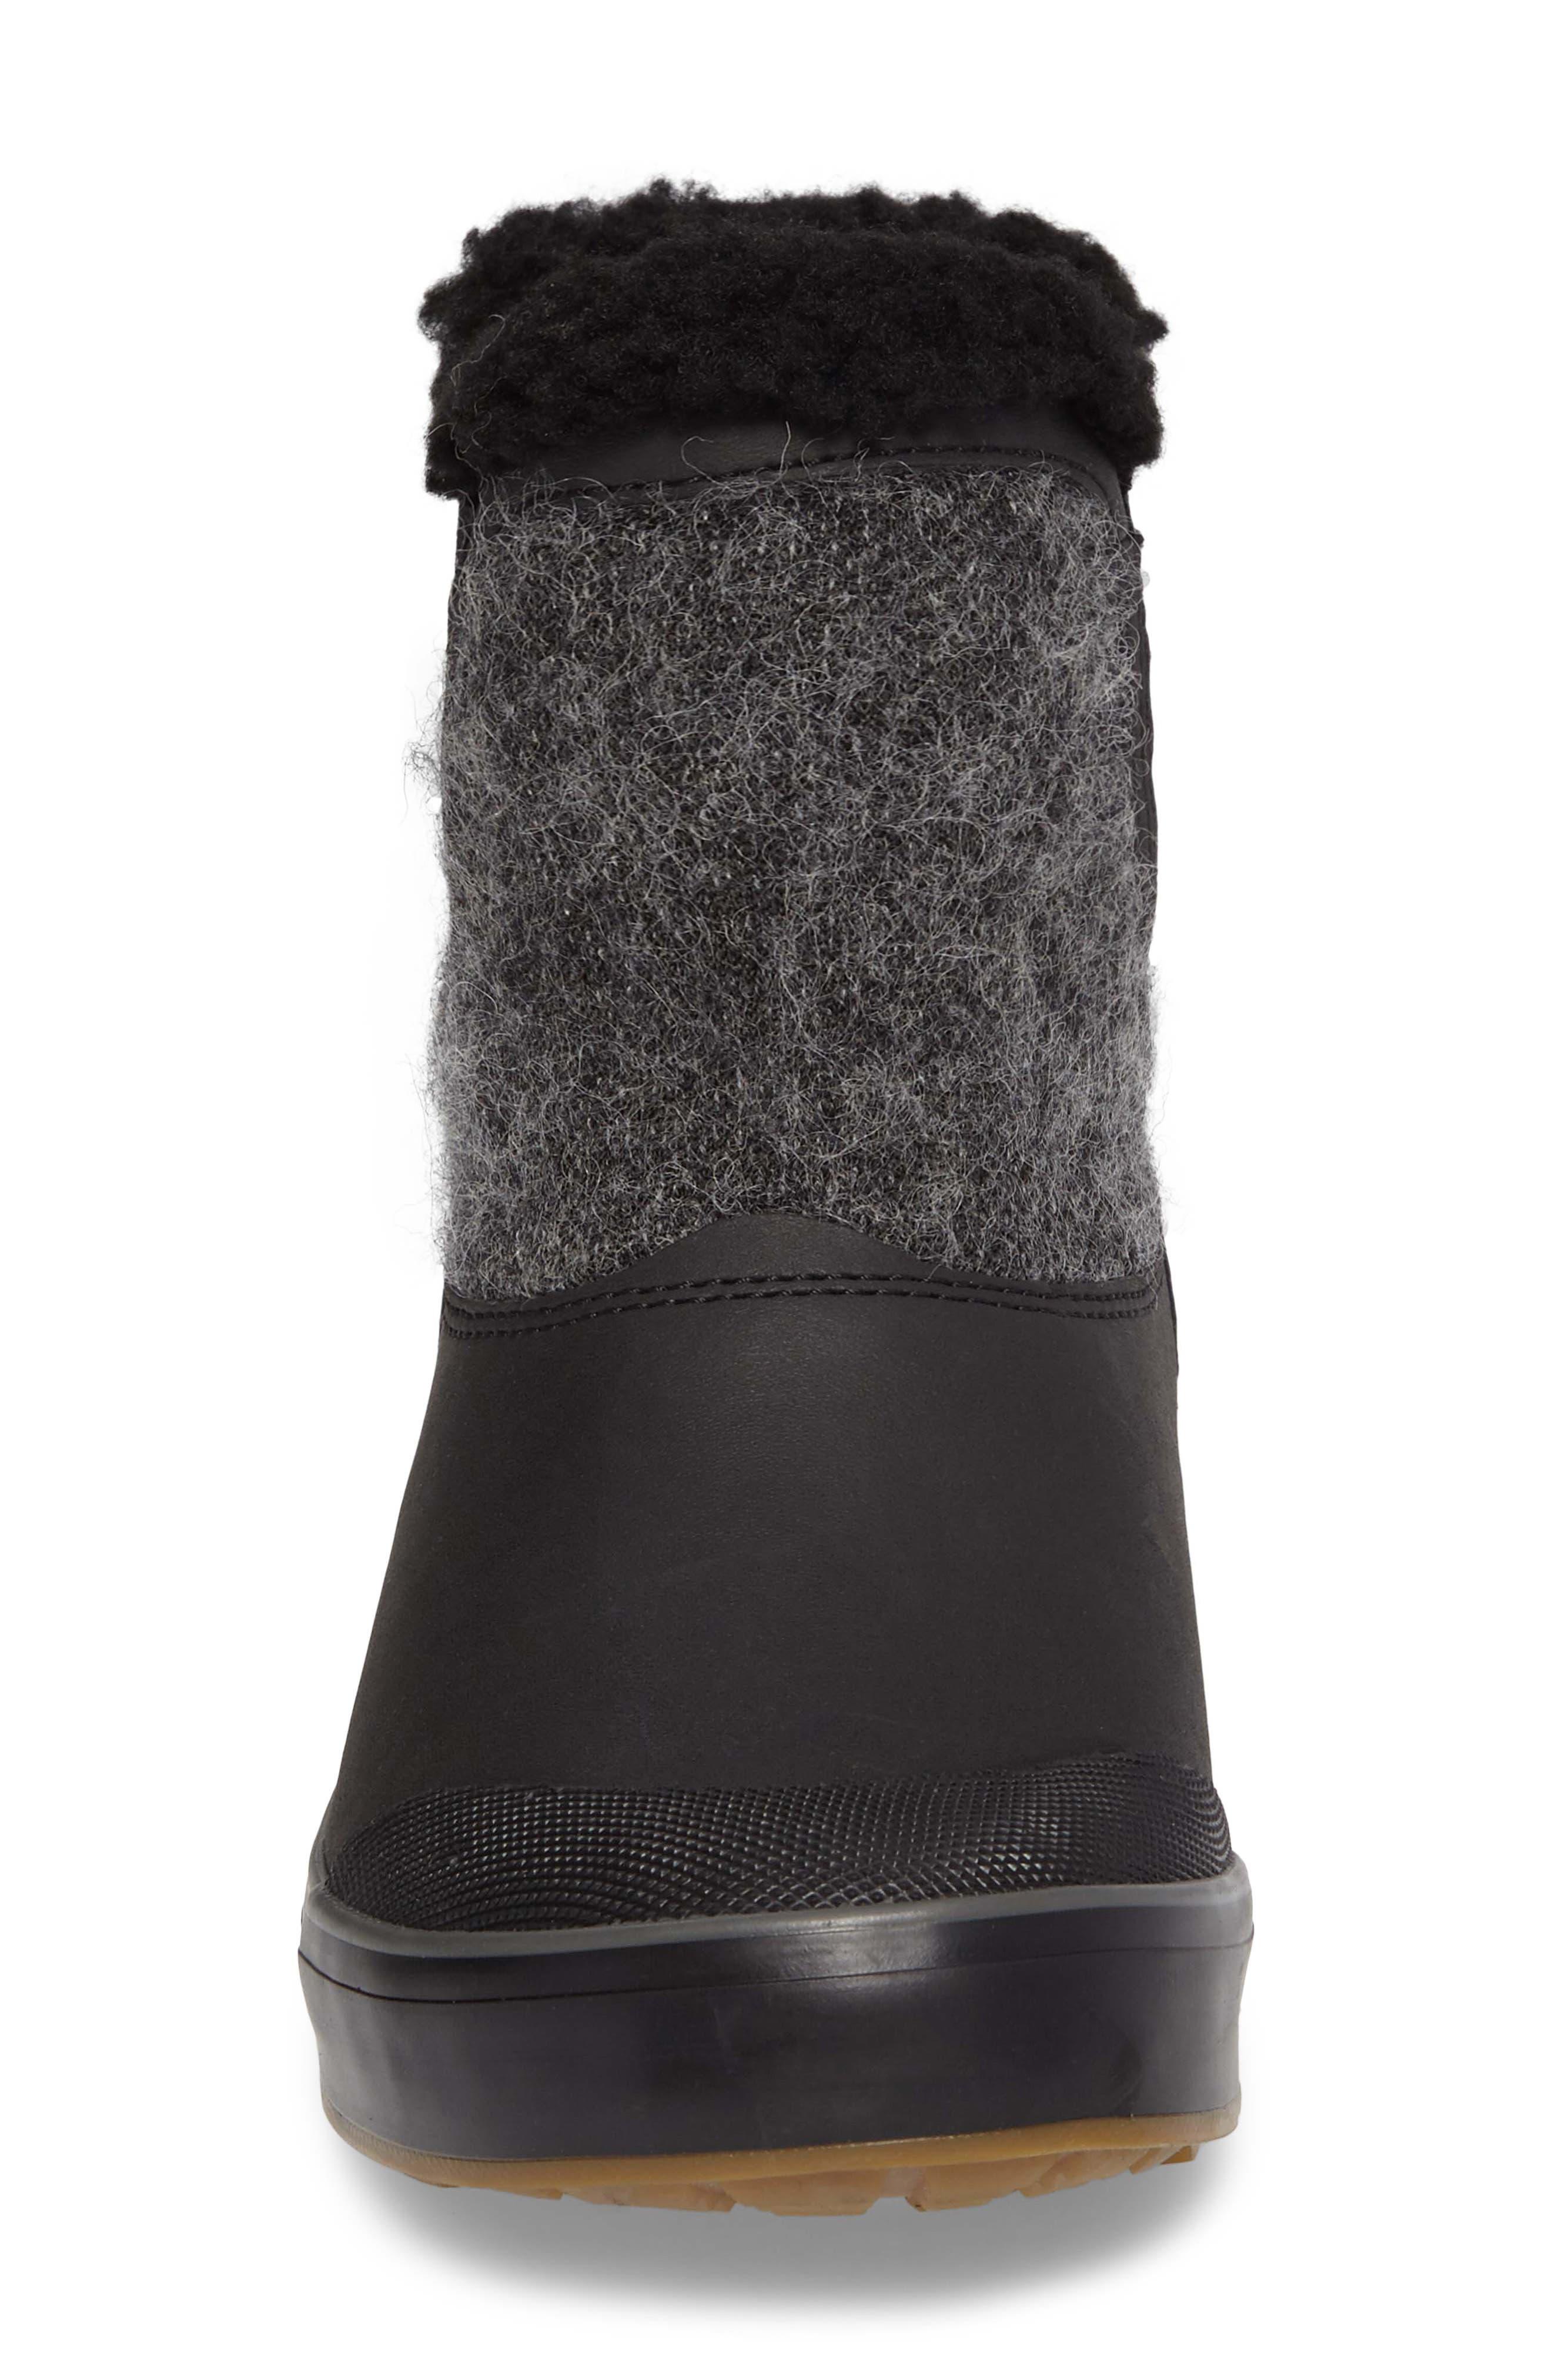 Elsa Chelsea Waterproof Faux Fur Lined Boot,                             Alternate thumbnail 4, color,                             Black Wool Leather